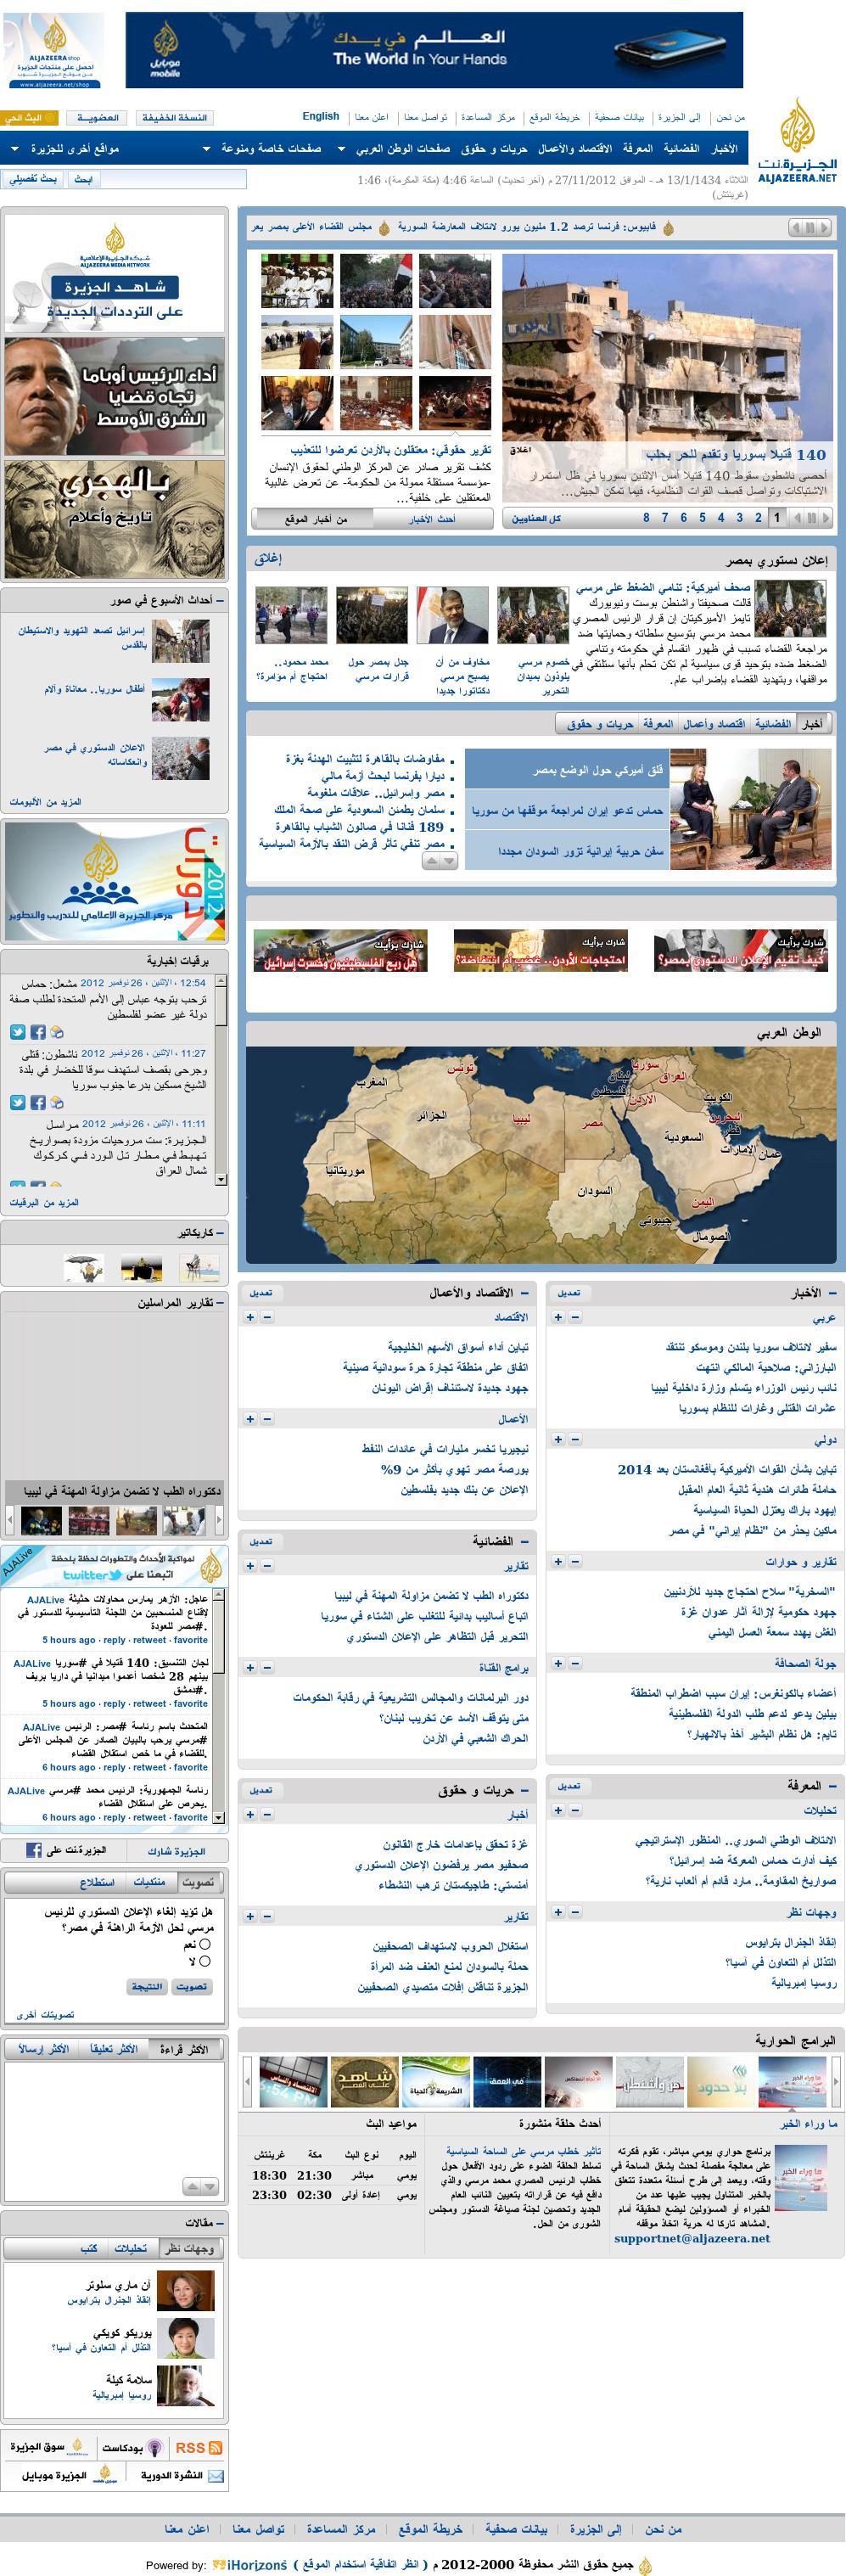 Al Jazeera at Tuesday Nov. 27, 2012, 2:16 a.m. UTC